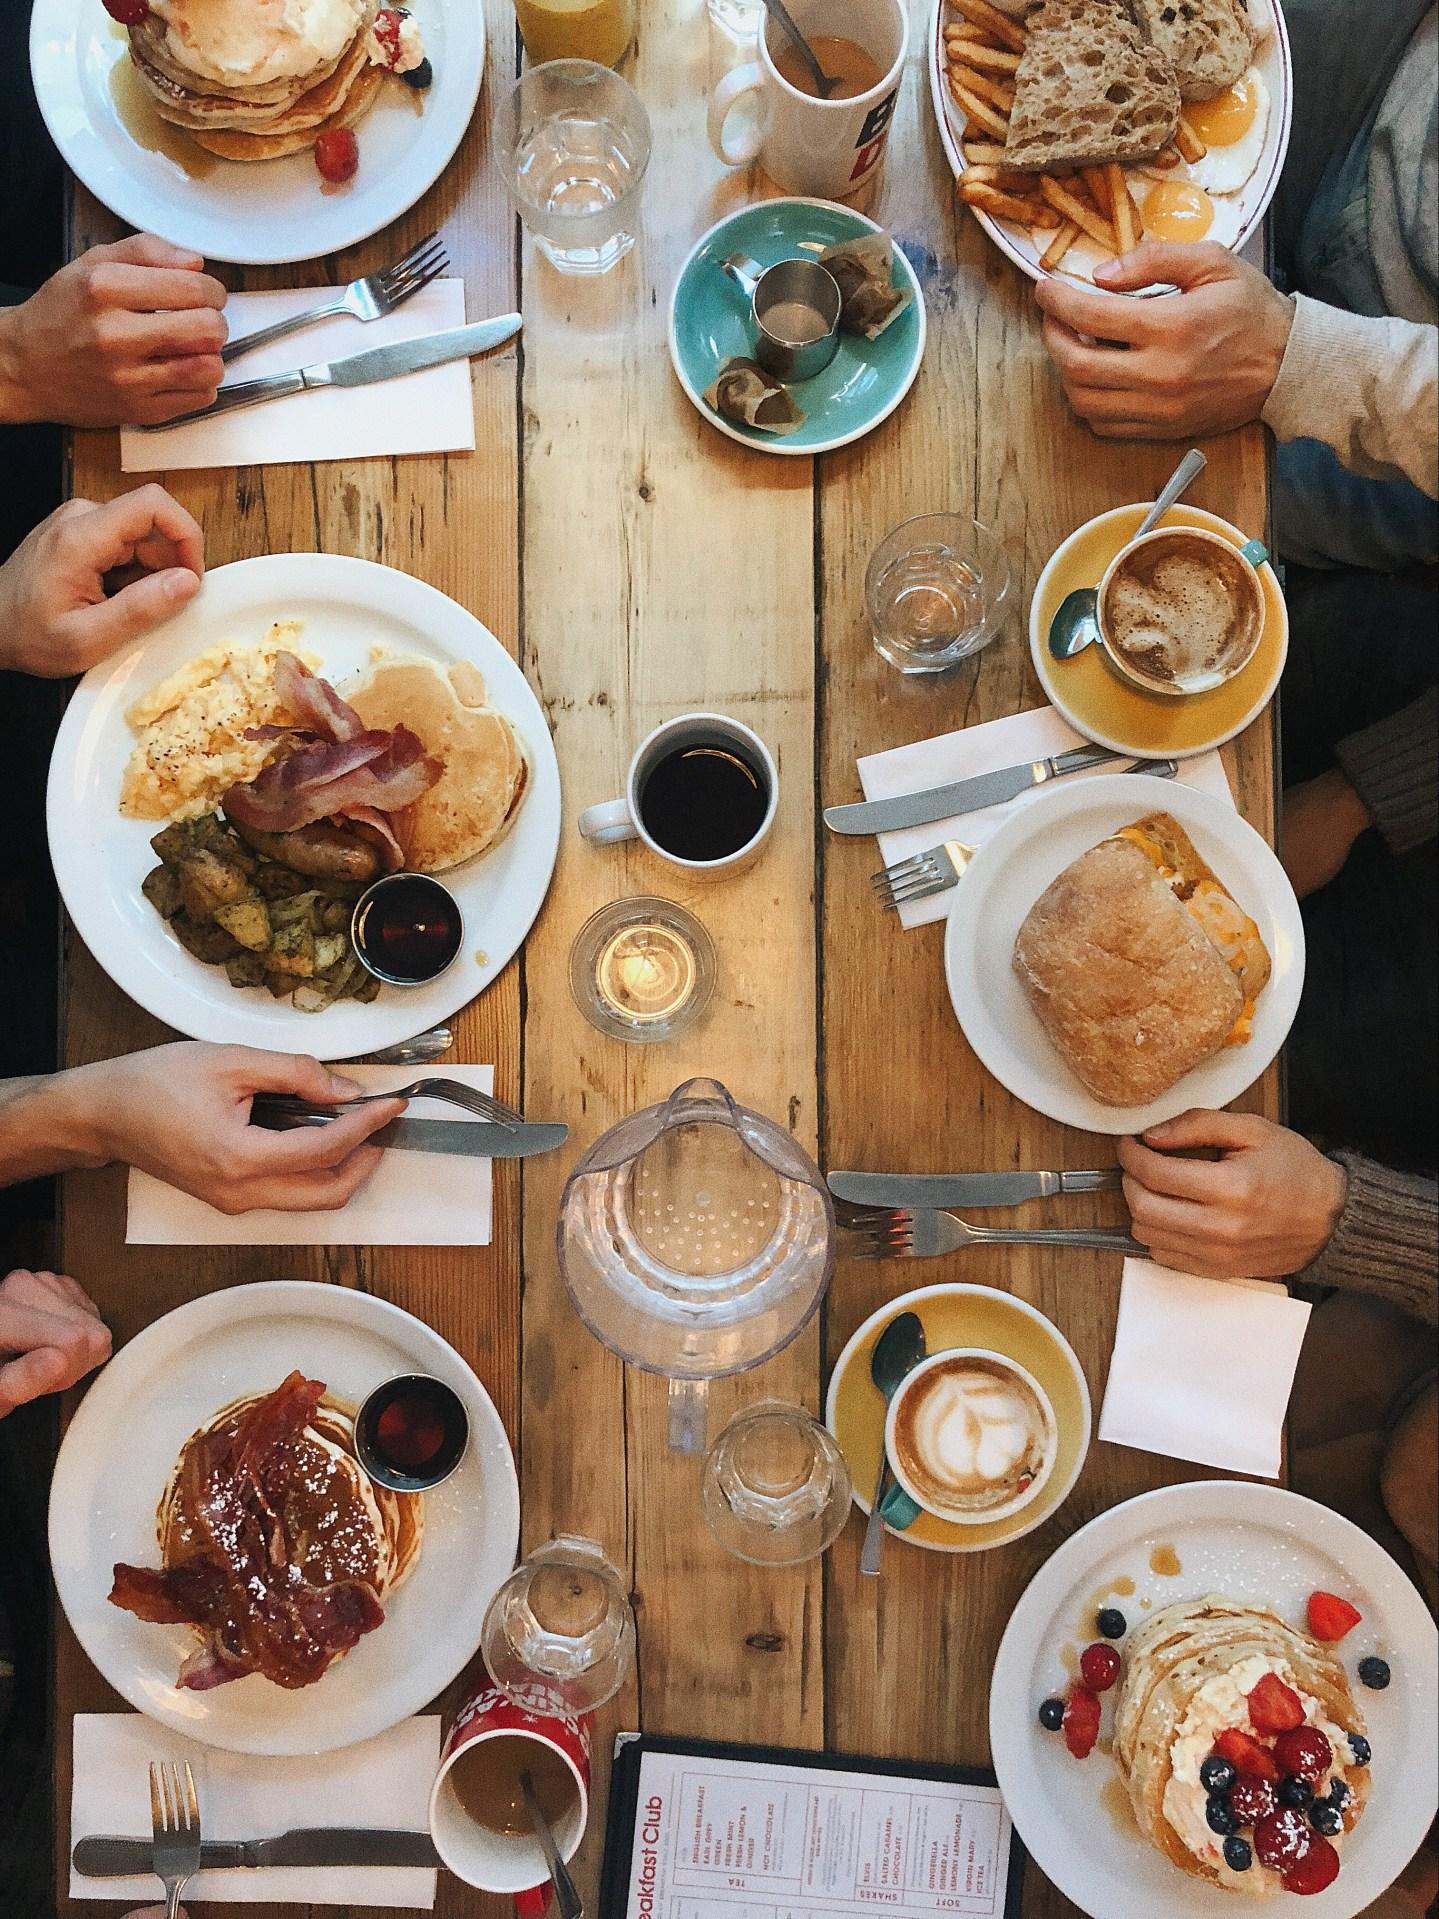 bekers, bijeenkomst, bord